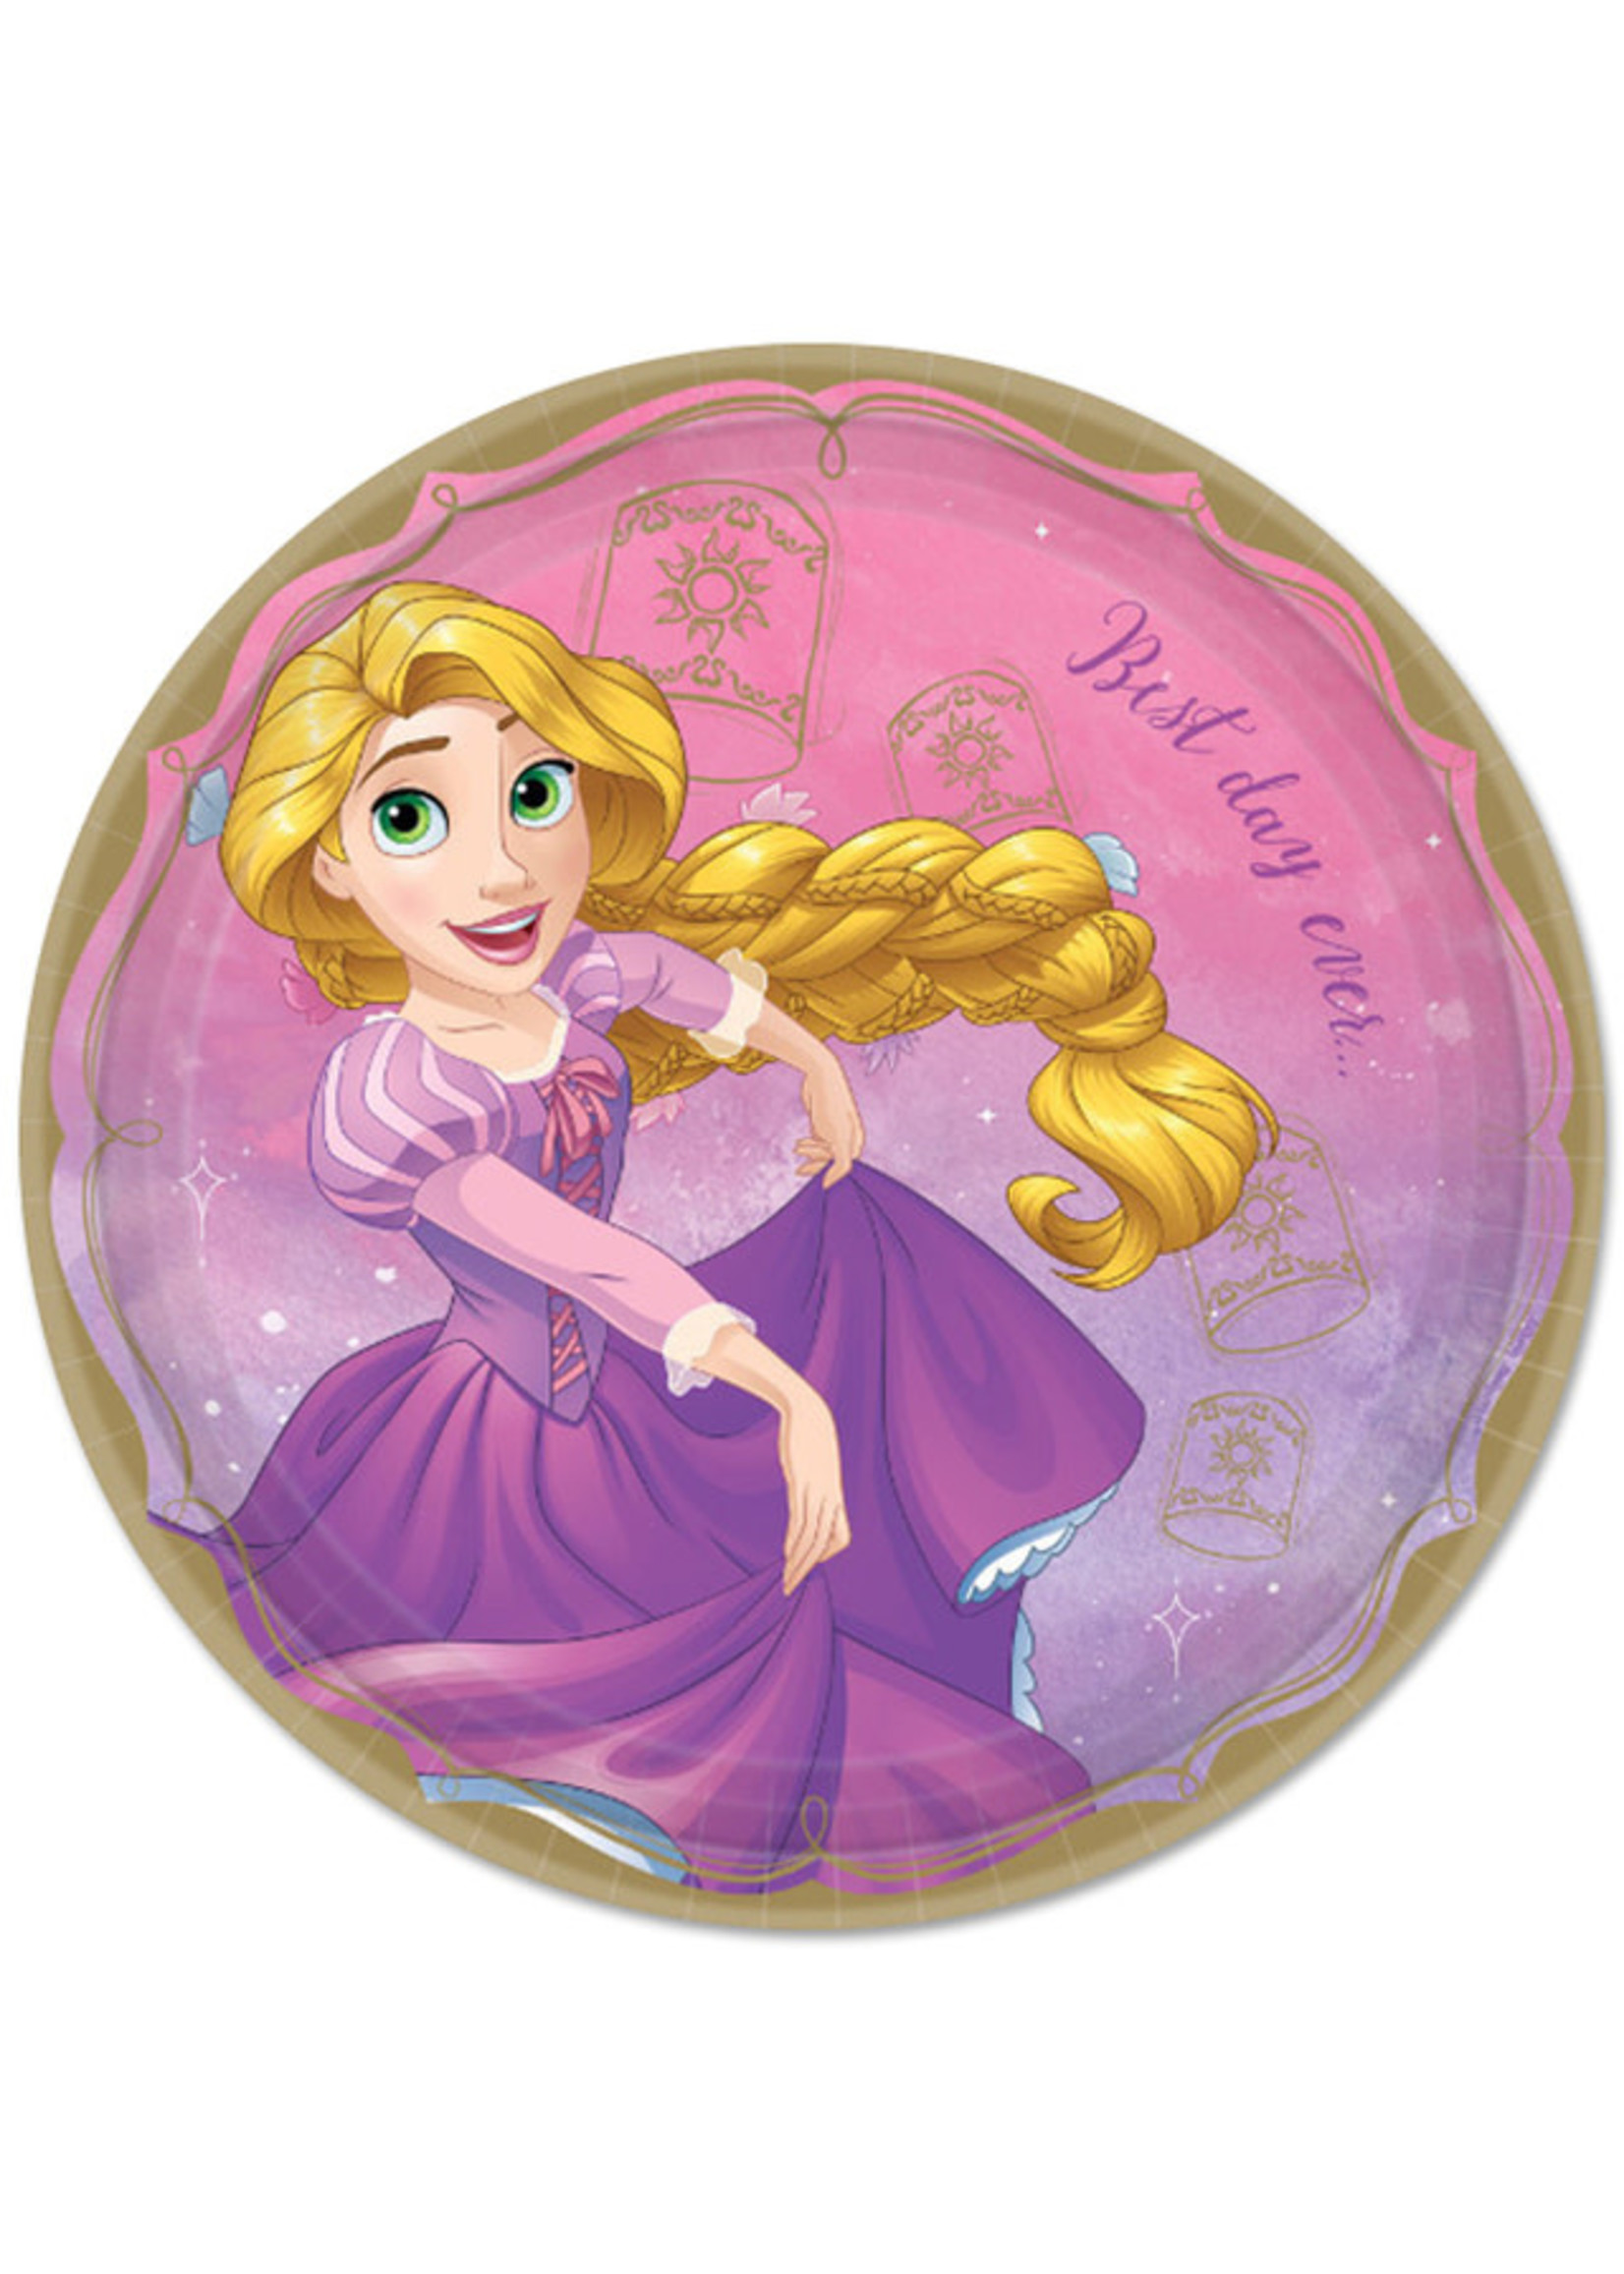 "Disney Princess Rapunzel 9"" Plates - 8ct"